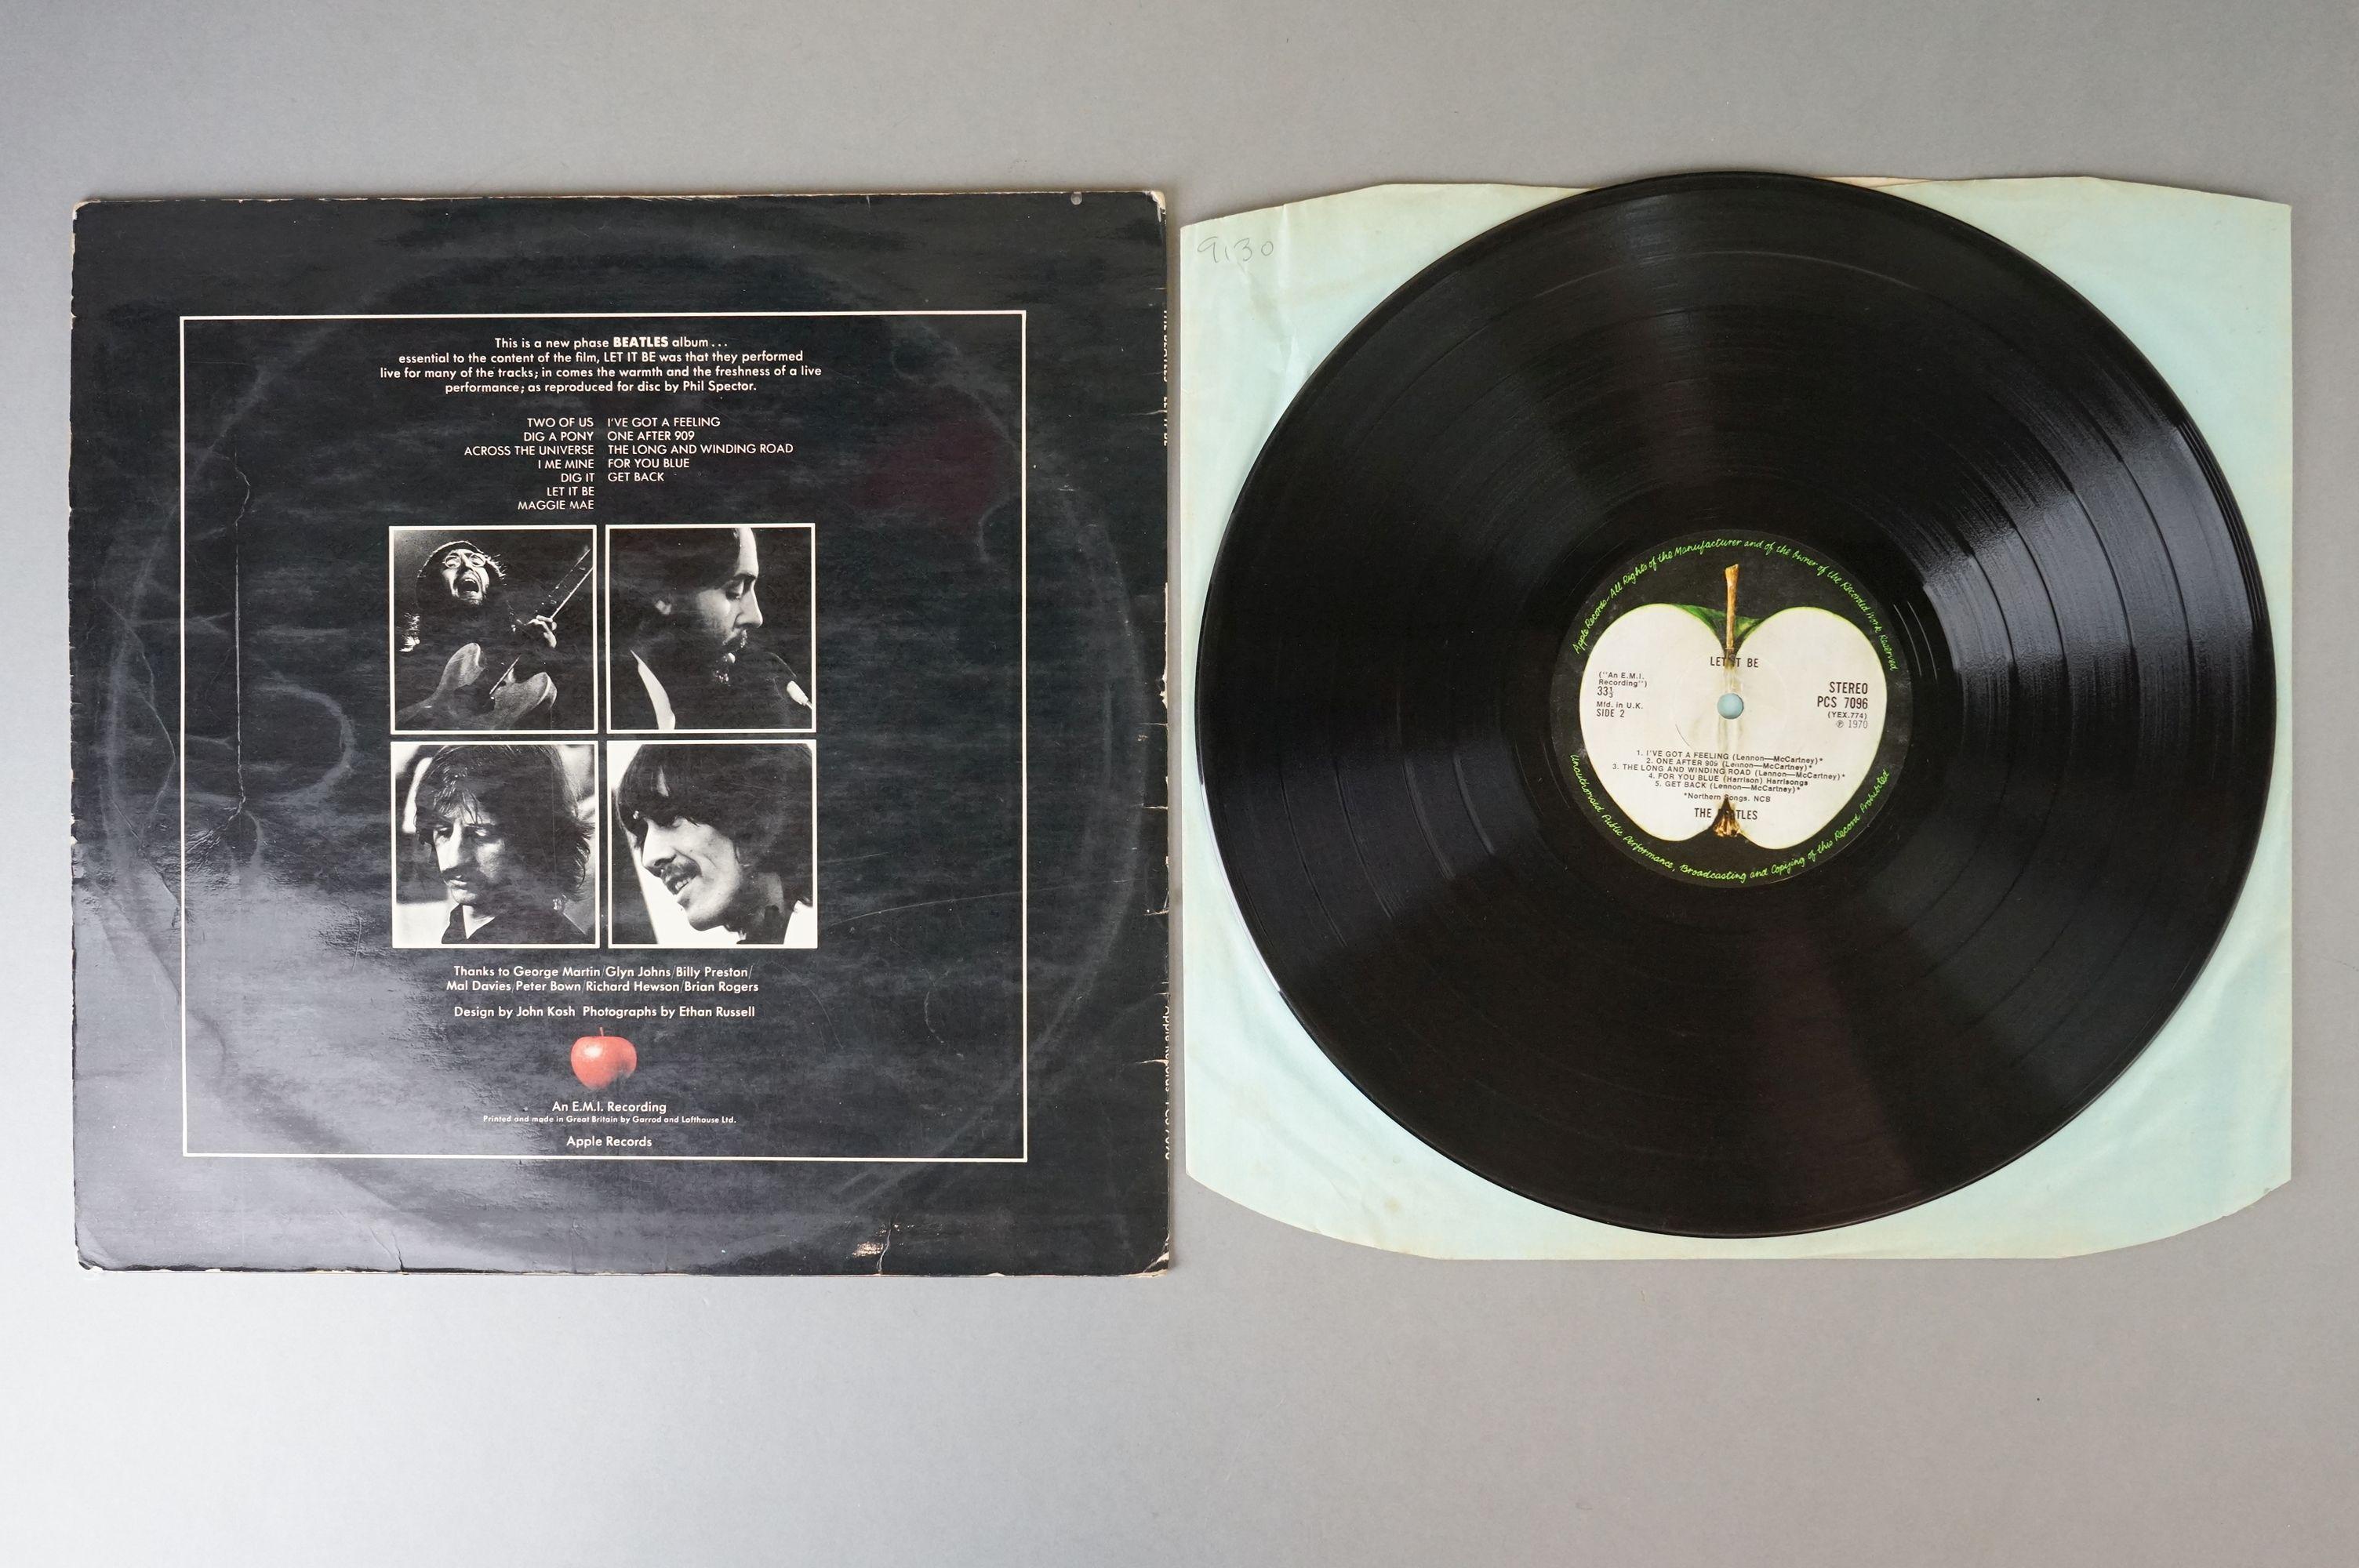 Vinyl - The Beatles & John Lennon 3 LP's to include Let It Be (PCS 7096) Stereo, incorrect inner, - Image 8 of 8